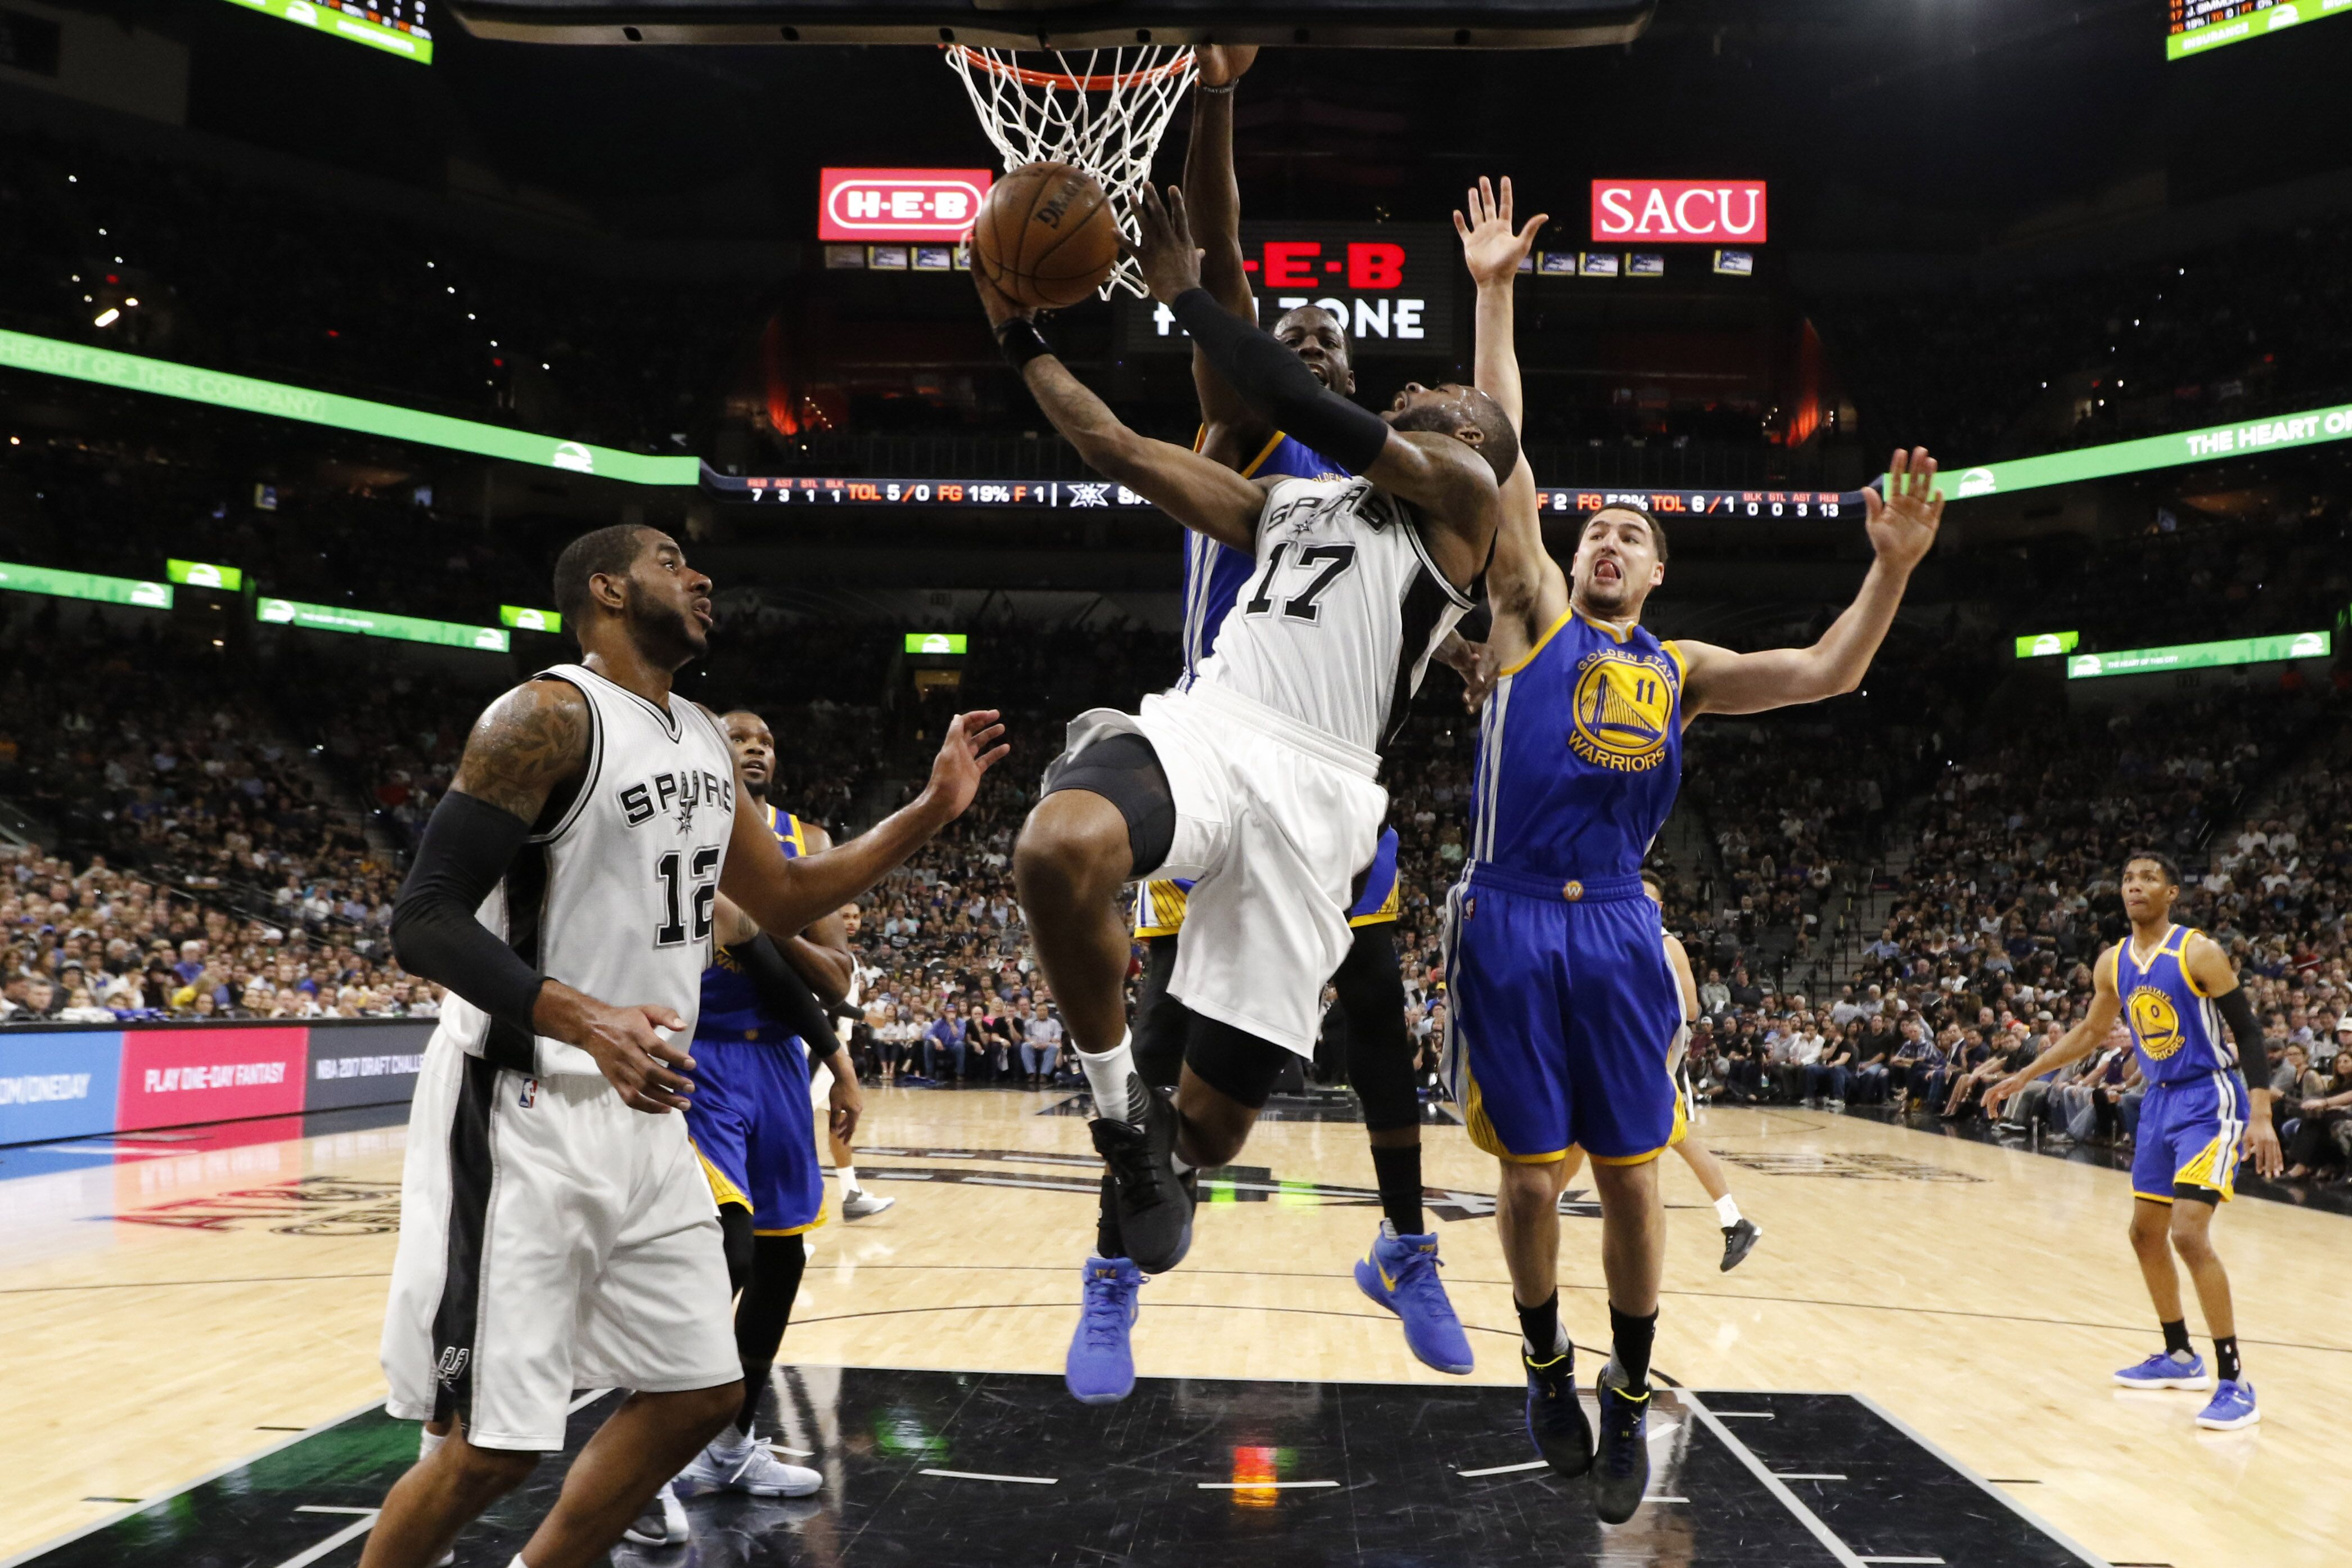 NBA Rumors: New York Knicks to target Jonathon Simmons in free agency